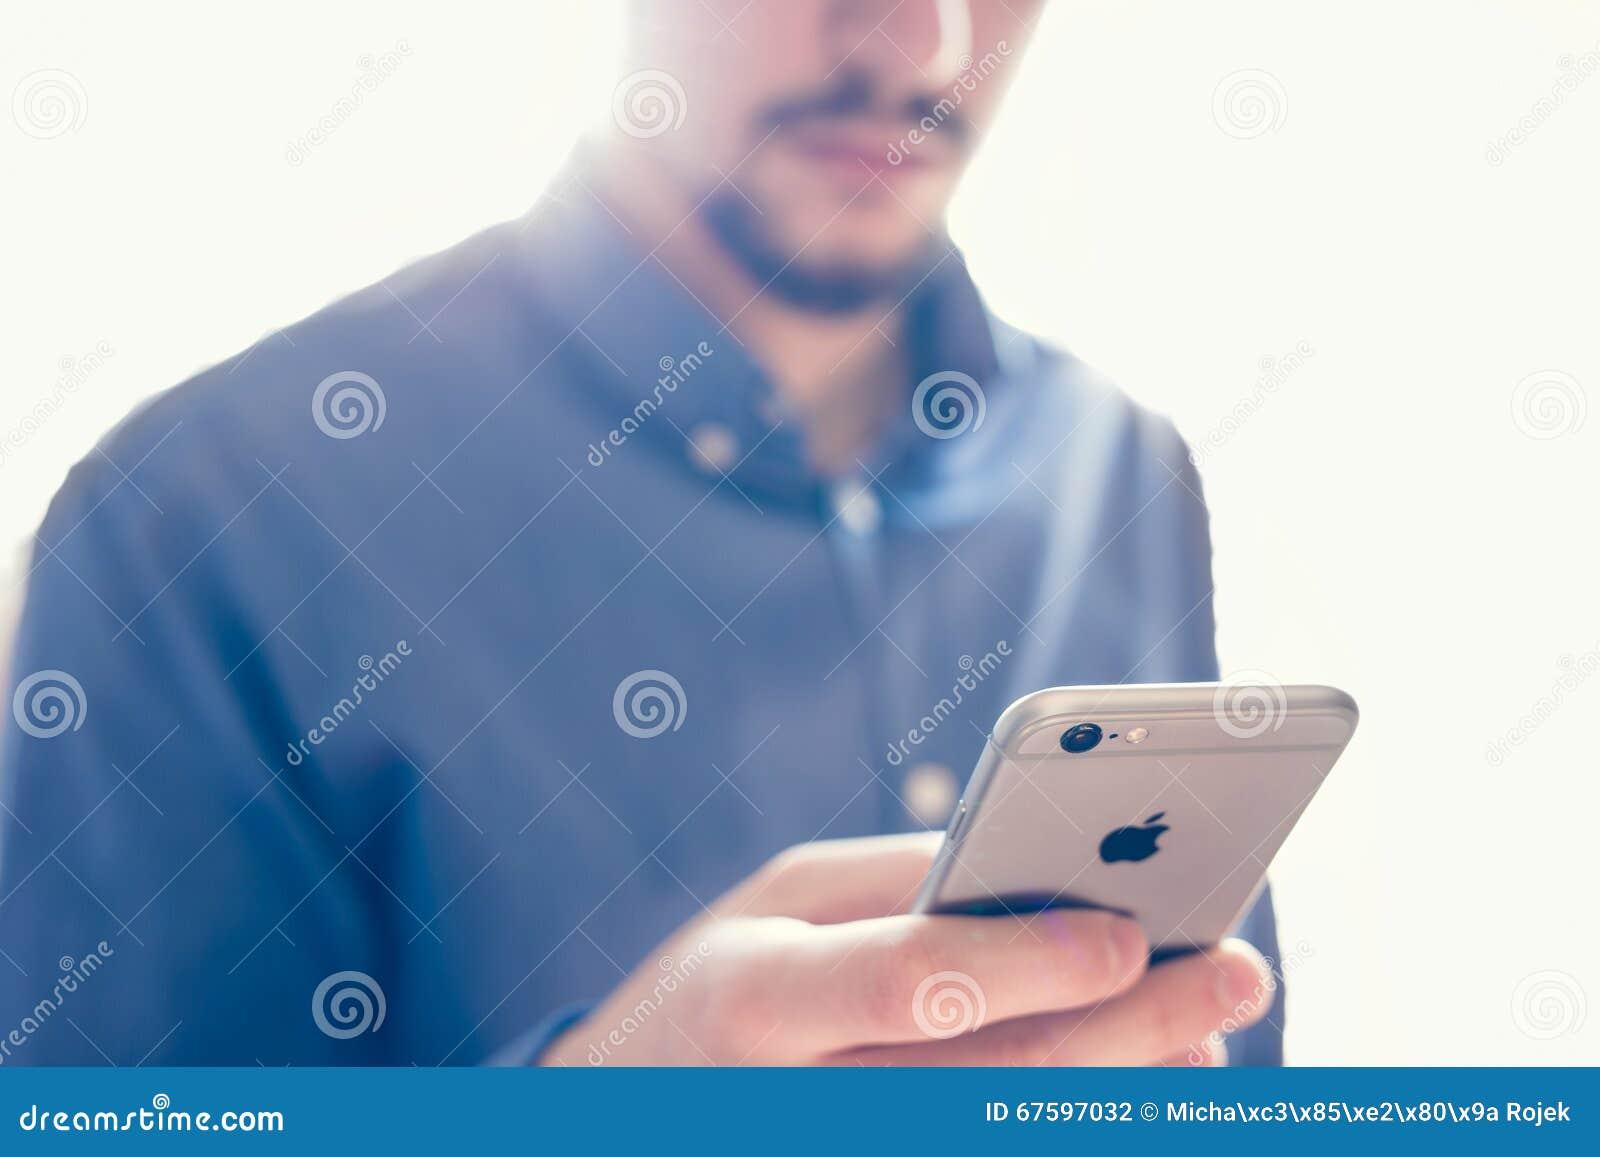 Бизнесмен держа новую сетчатку iPhone 6s Яблока